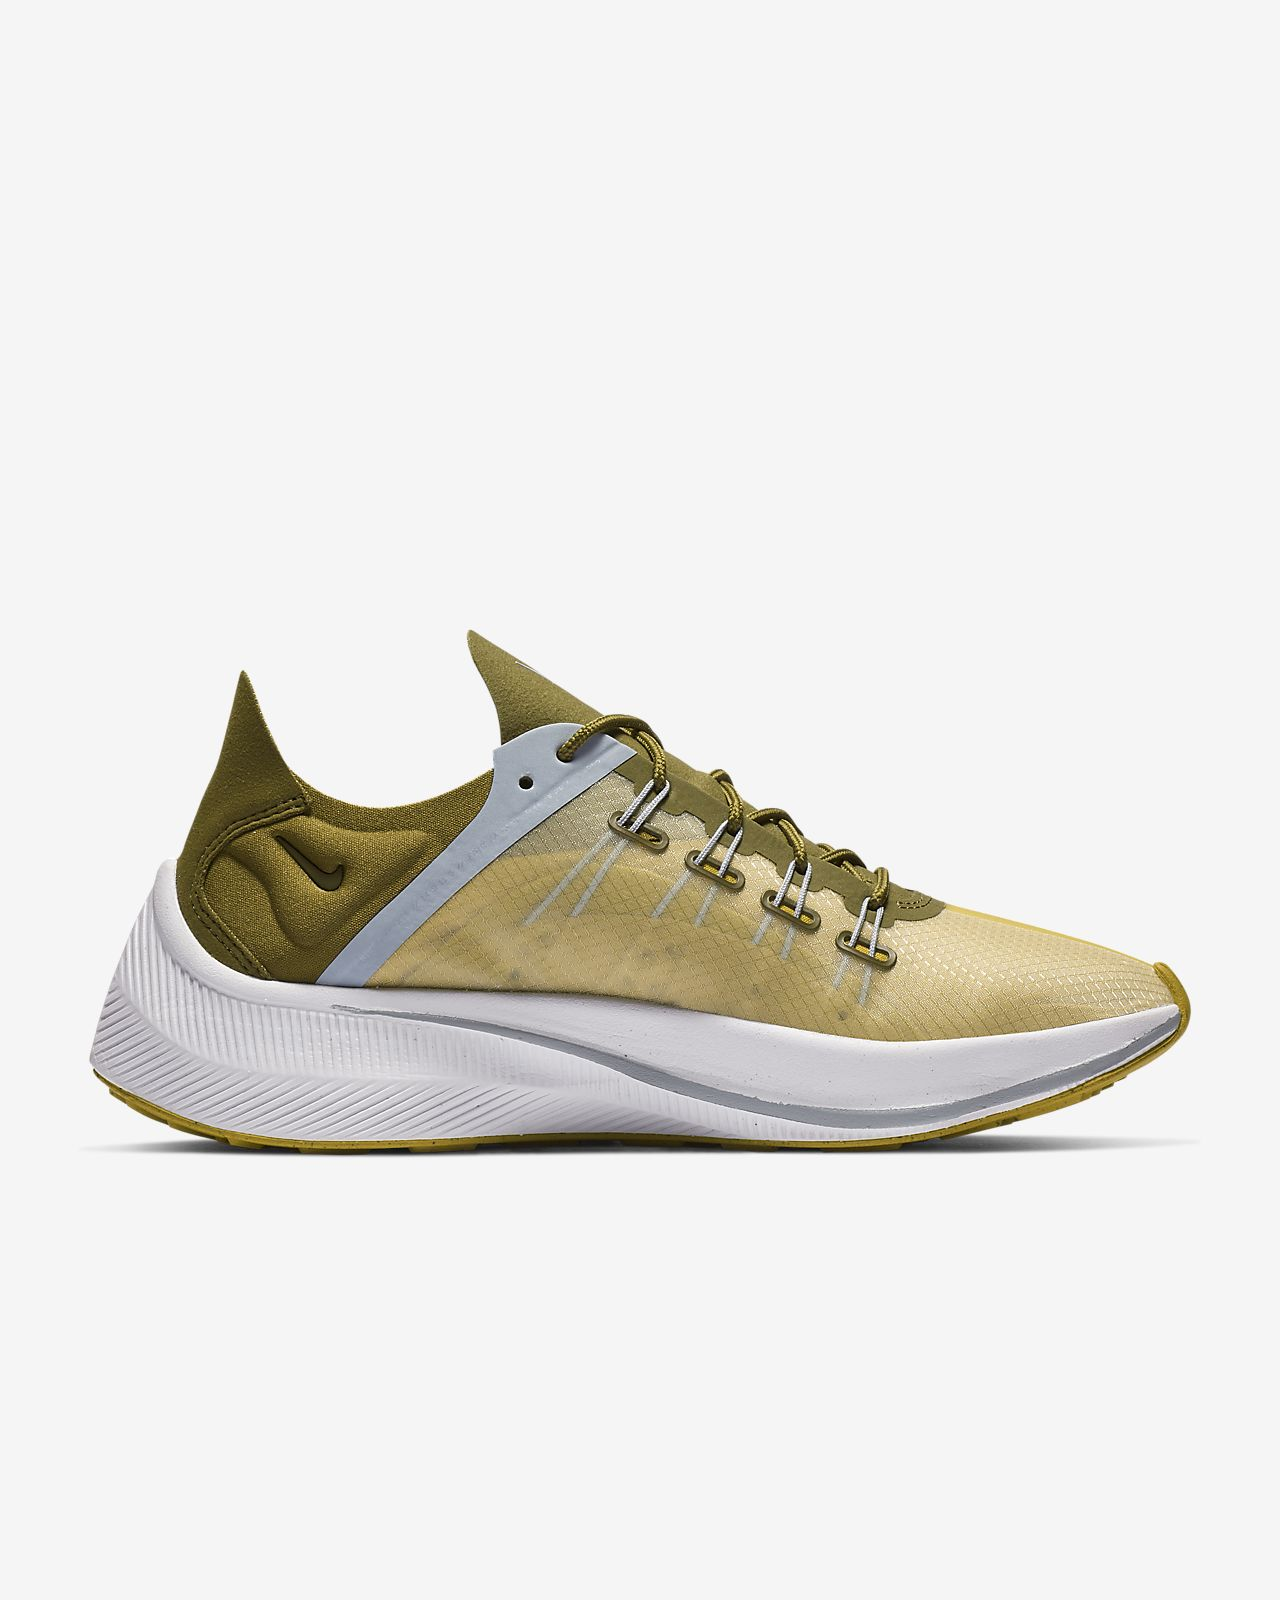 newest 6075e fdca9 ... Nike EXP-X14 Women s Shoe